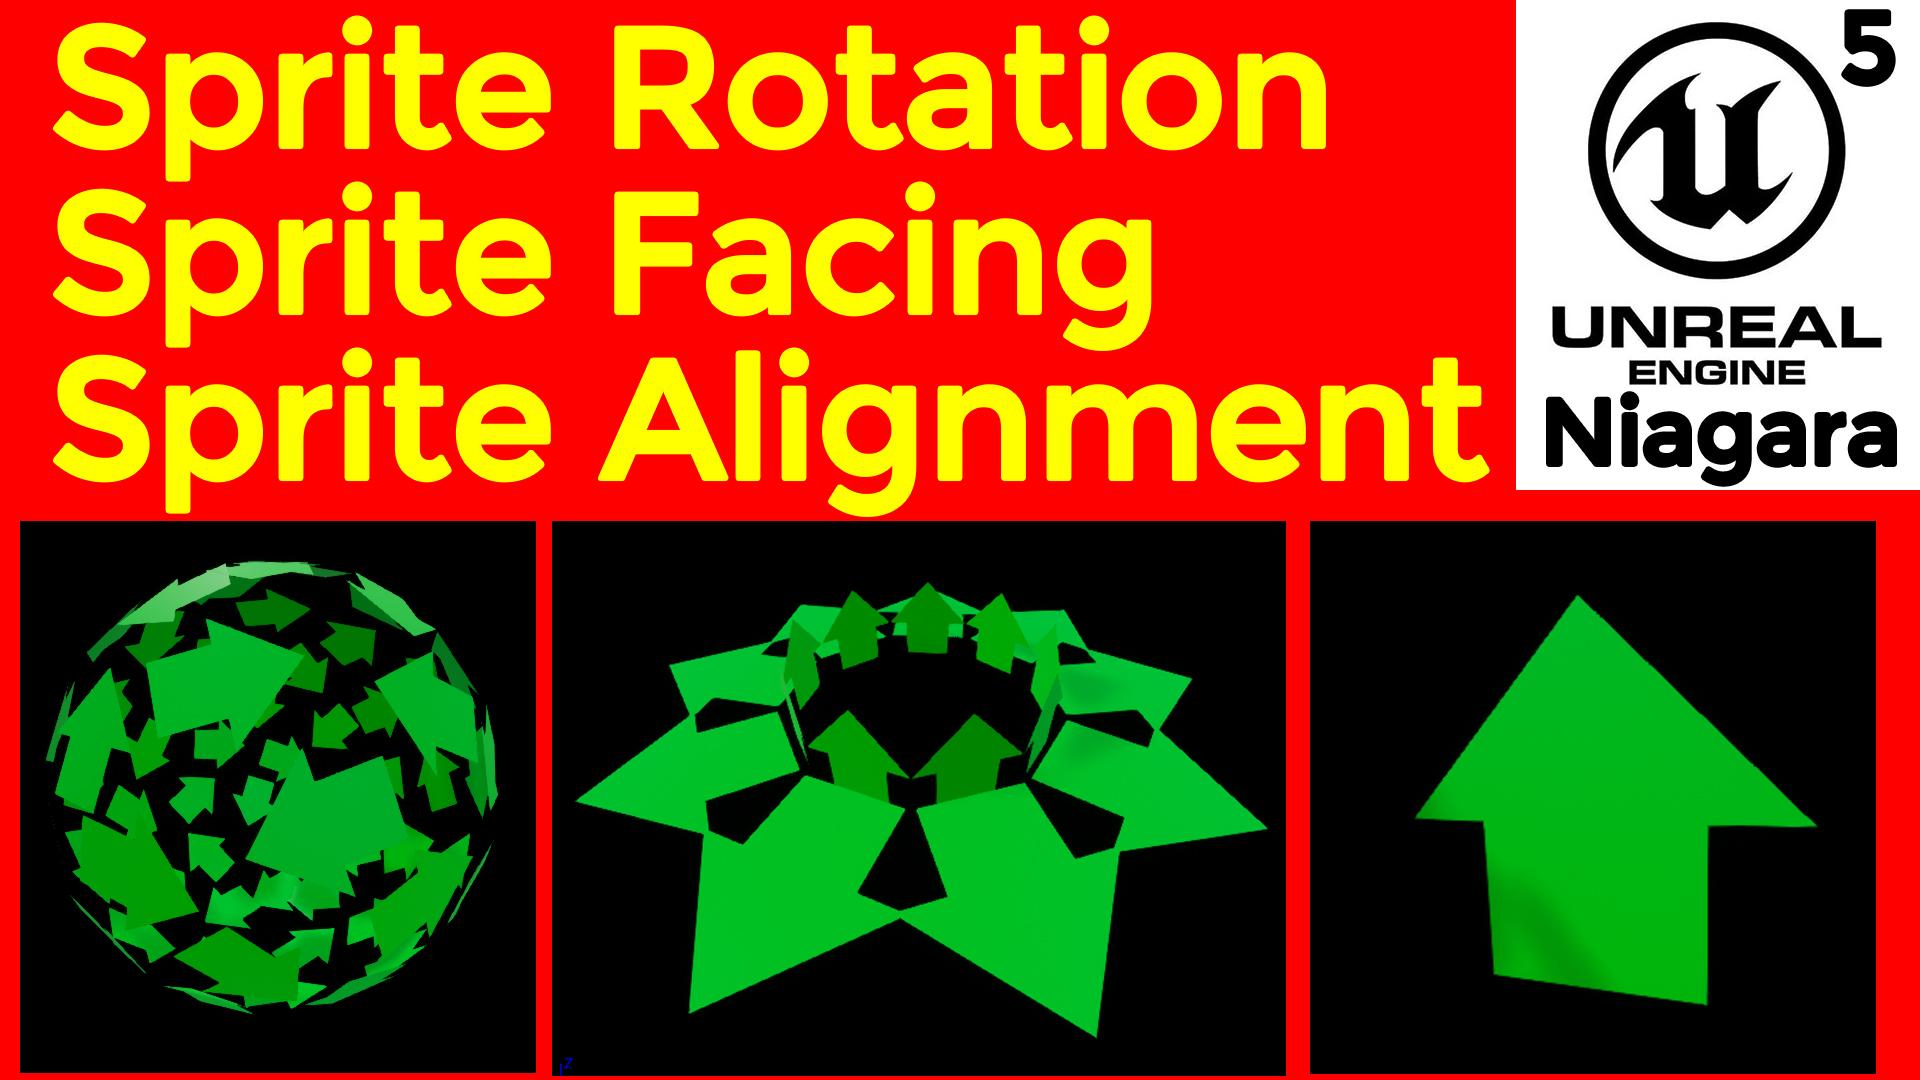 Sprite Rotation Sprite Alignment Sprite Facing   UE5 Niagara Tutorial   Download Project File